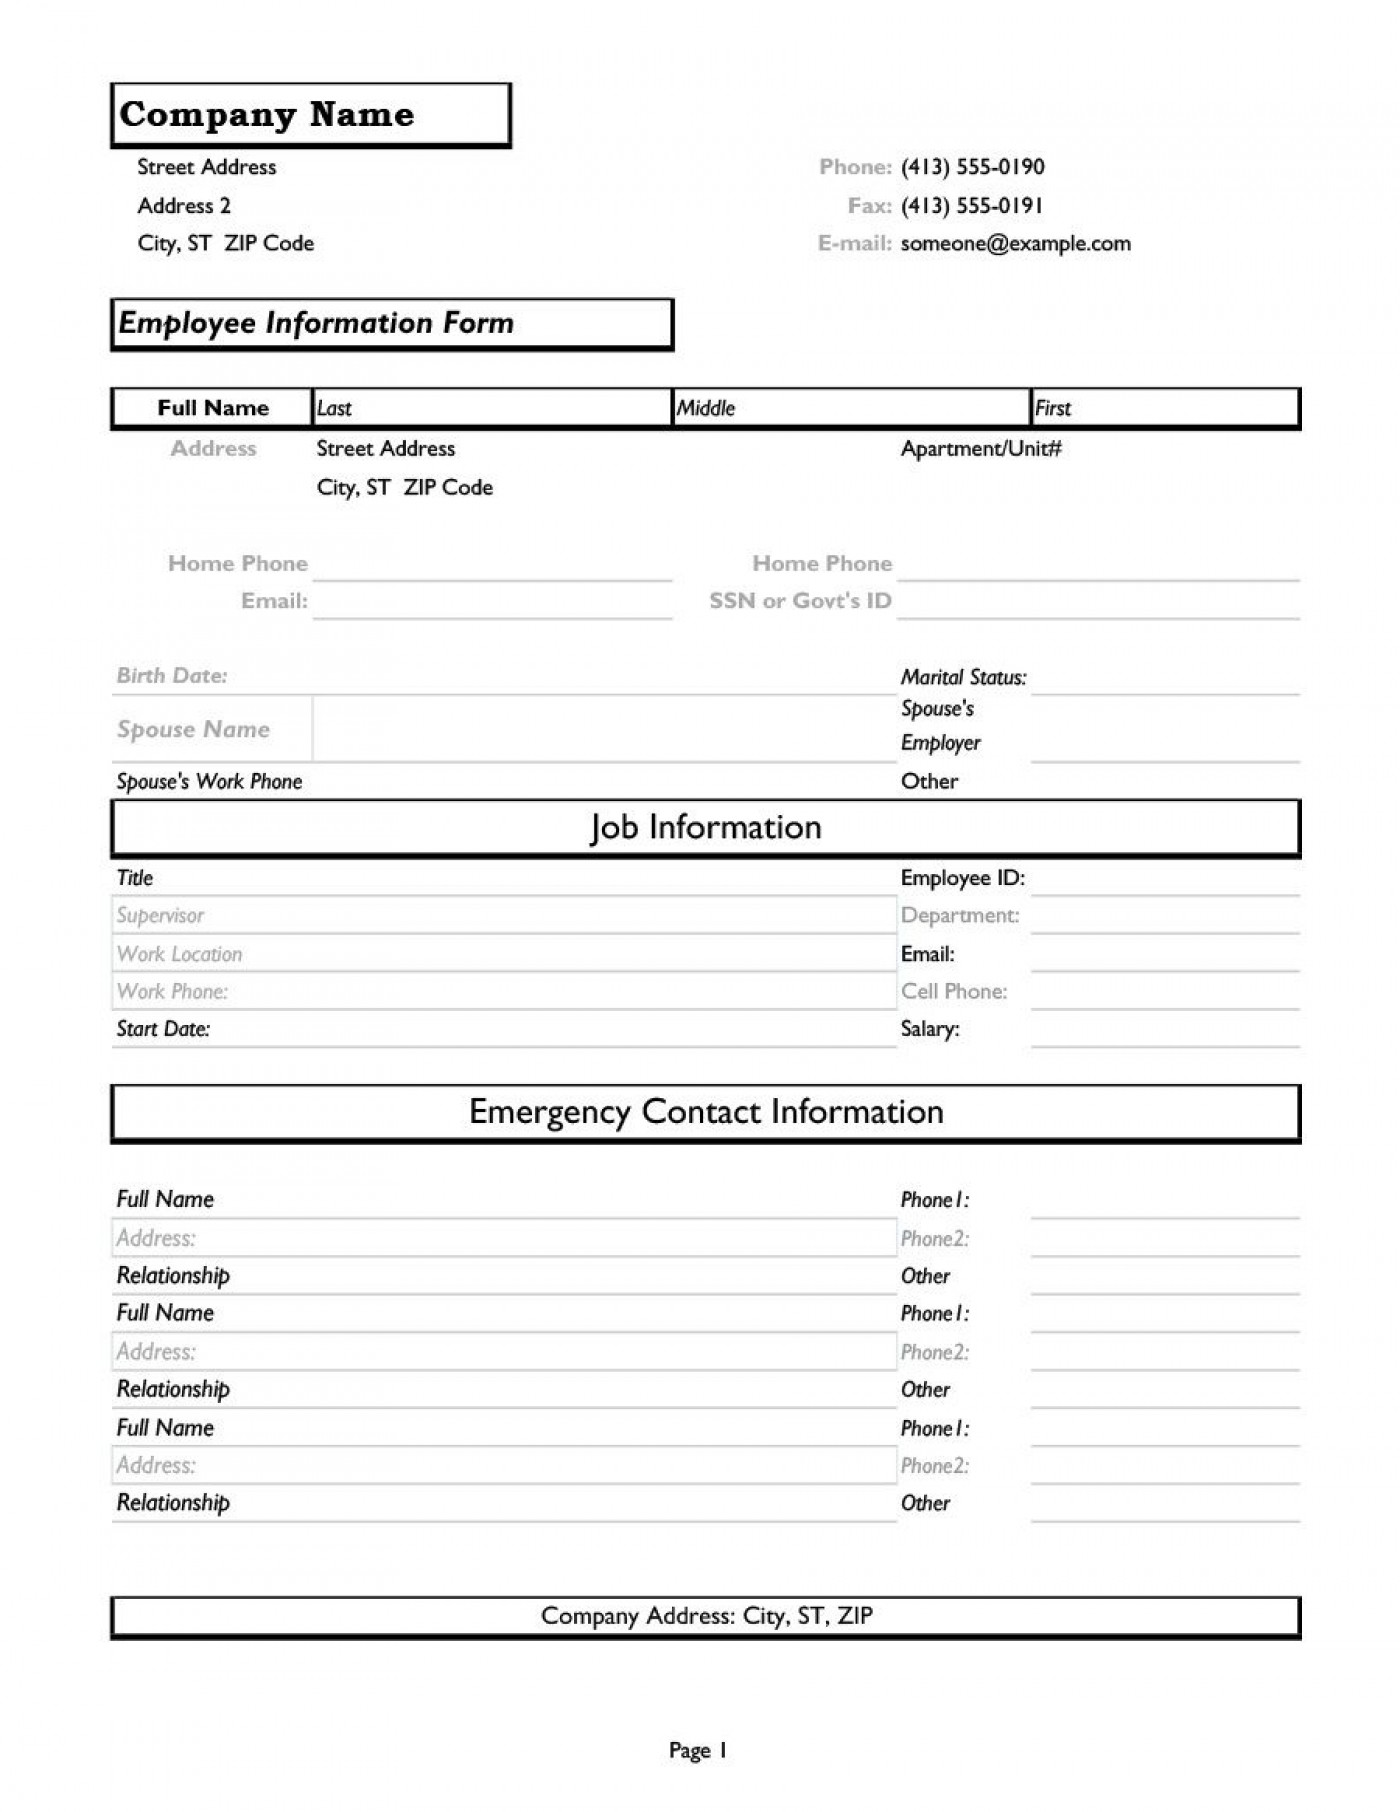 012 Unique Employee Personnel File Template Image  Uk Form Checklist1400